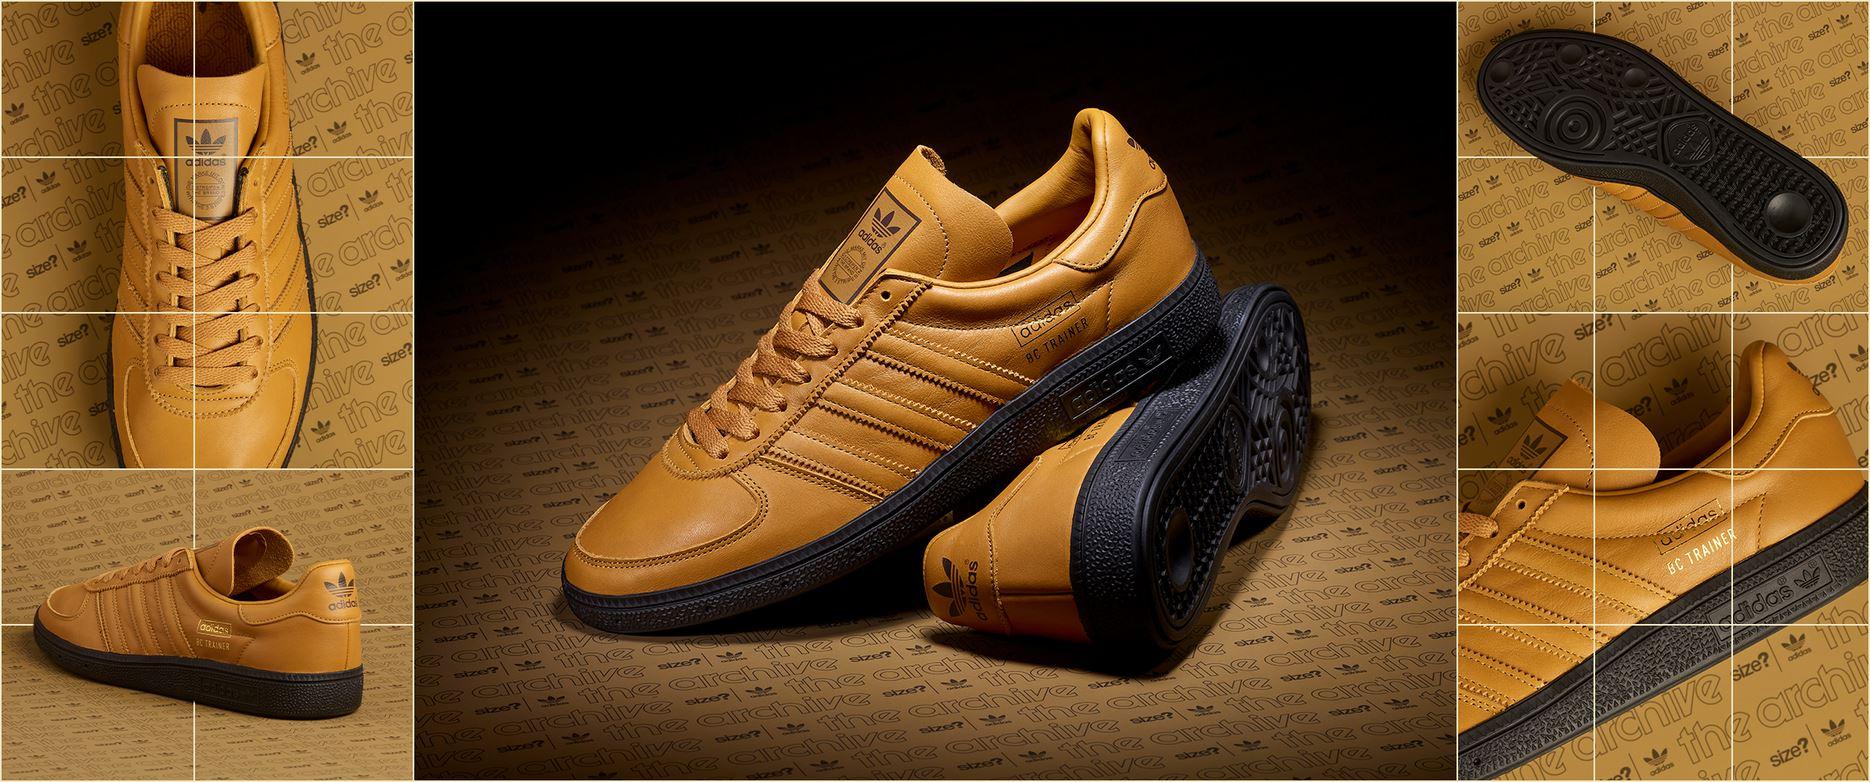 adidas original leather